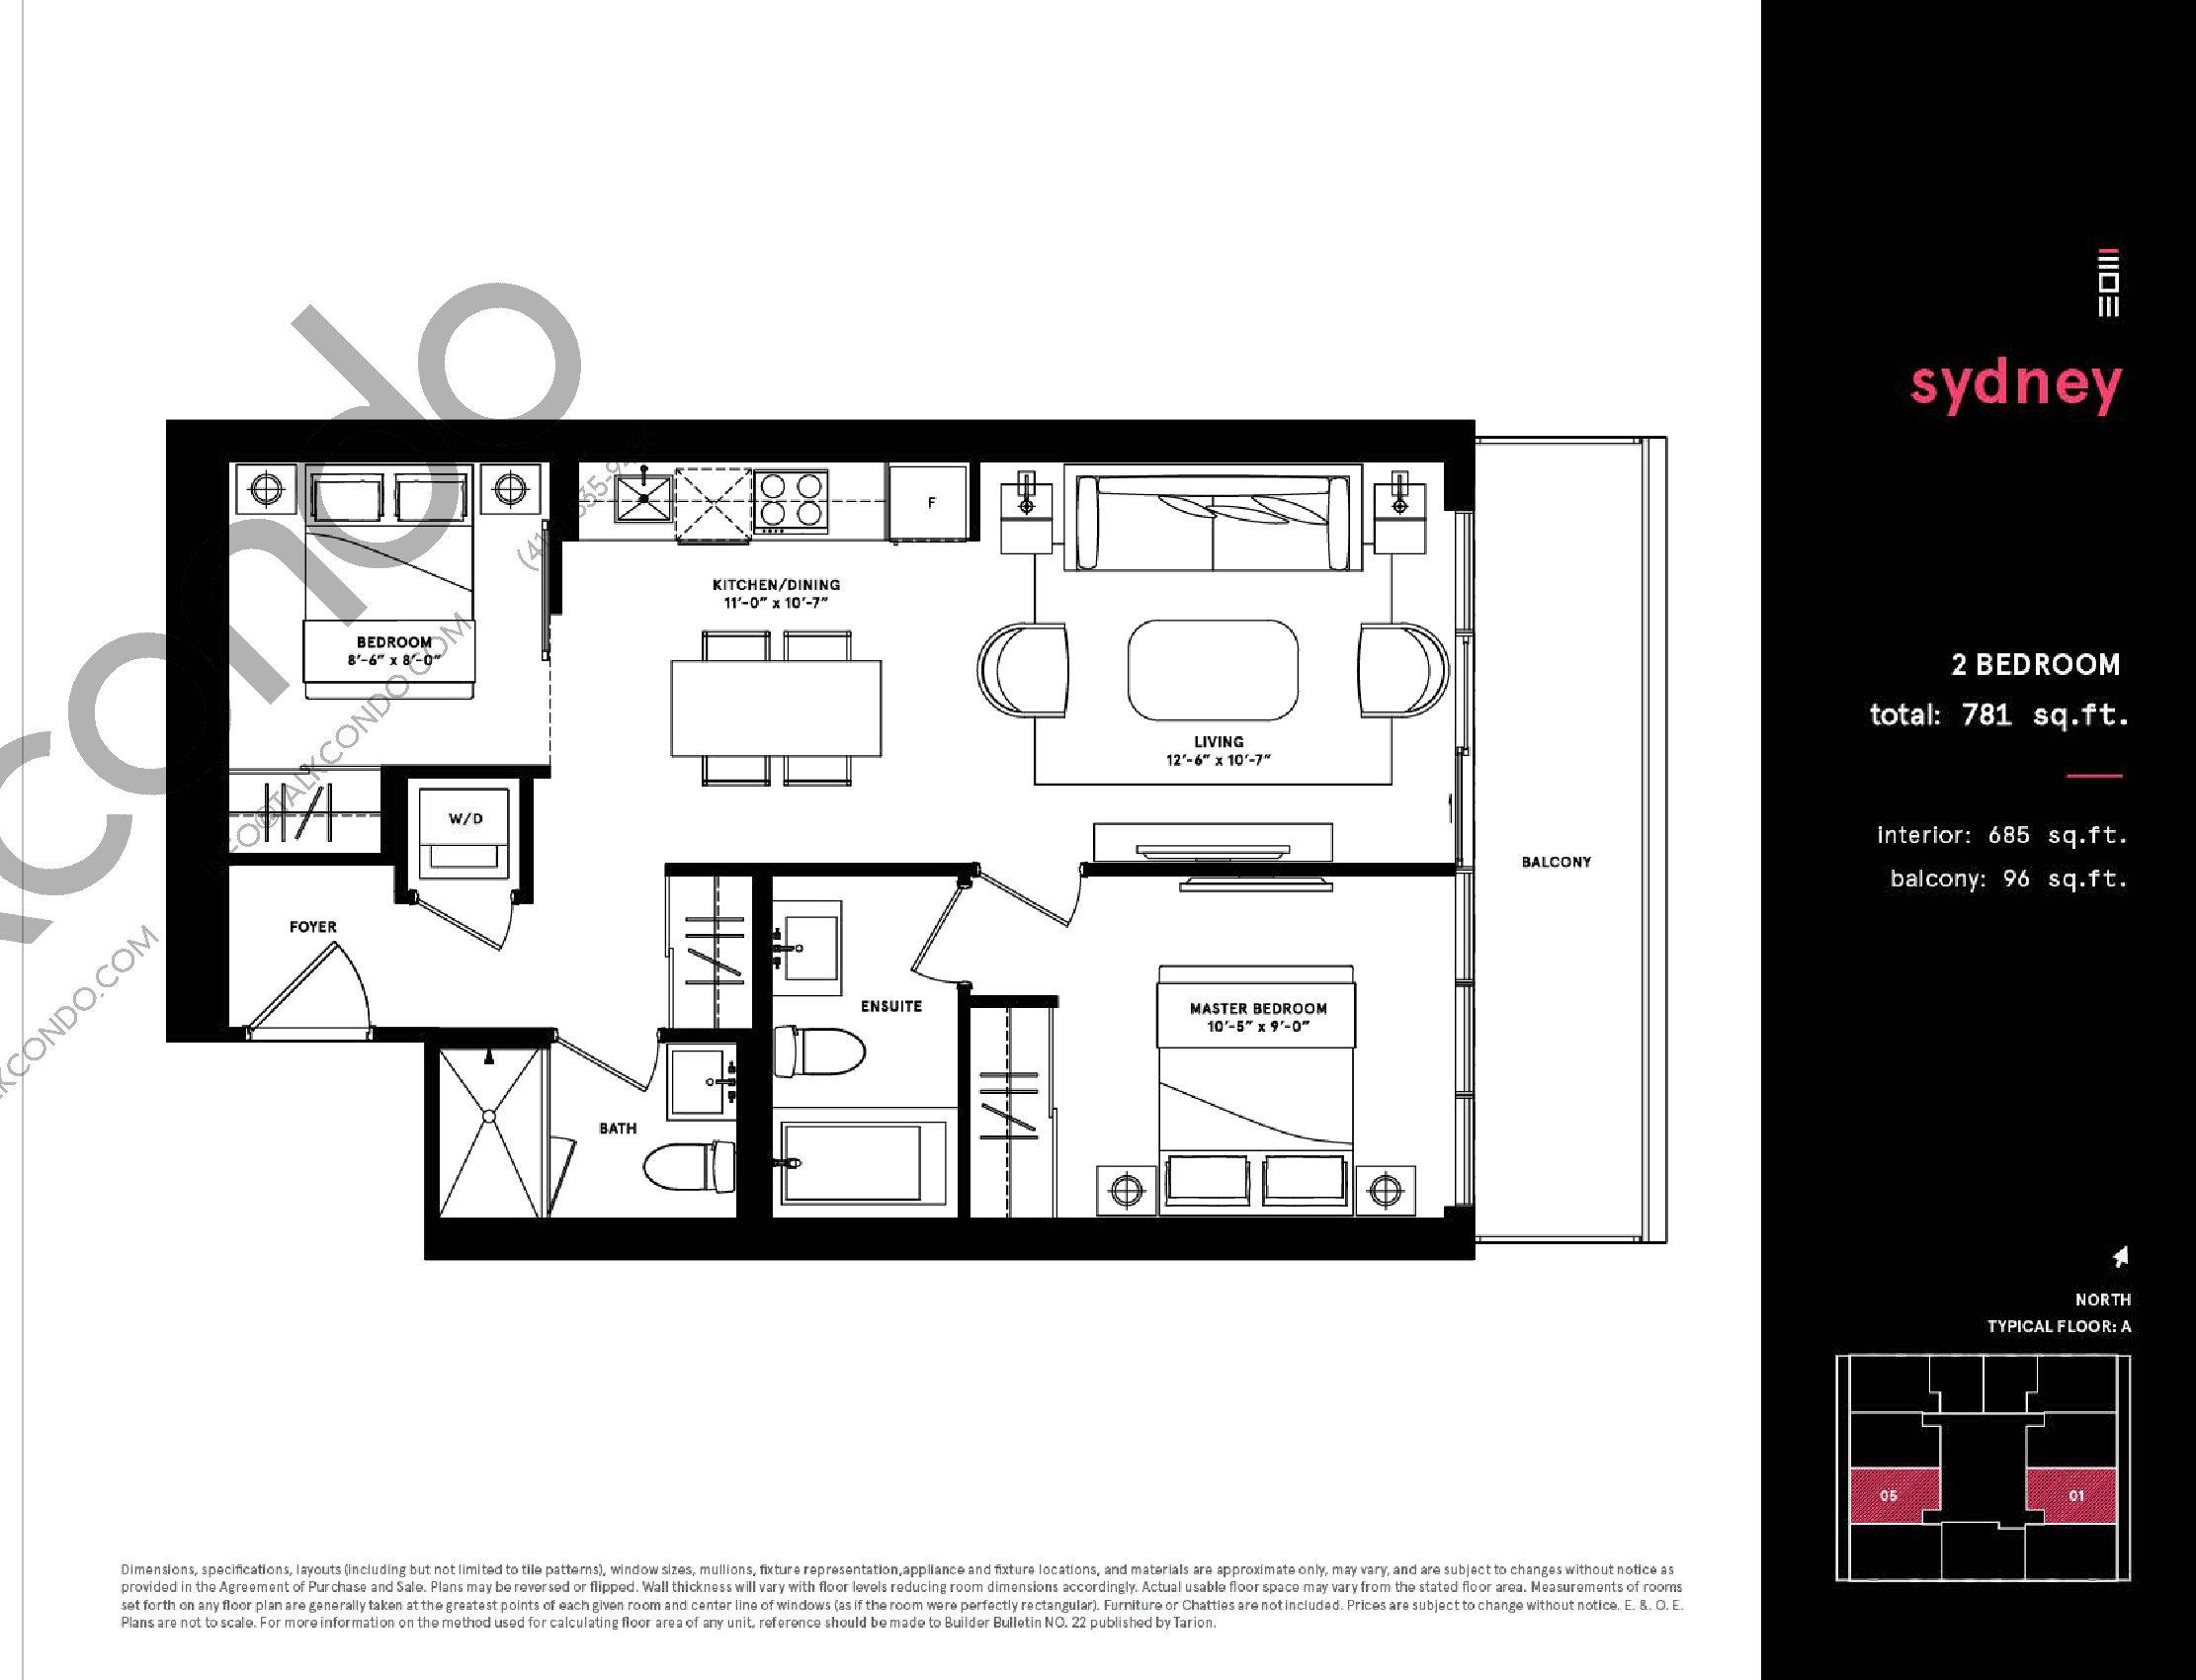 Sydney Floor Plan at Exchange District Condos - 685 sq.ft